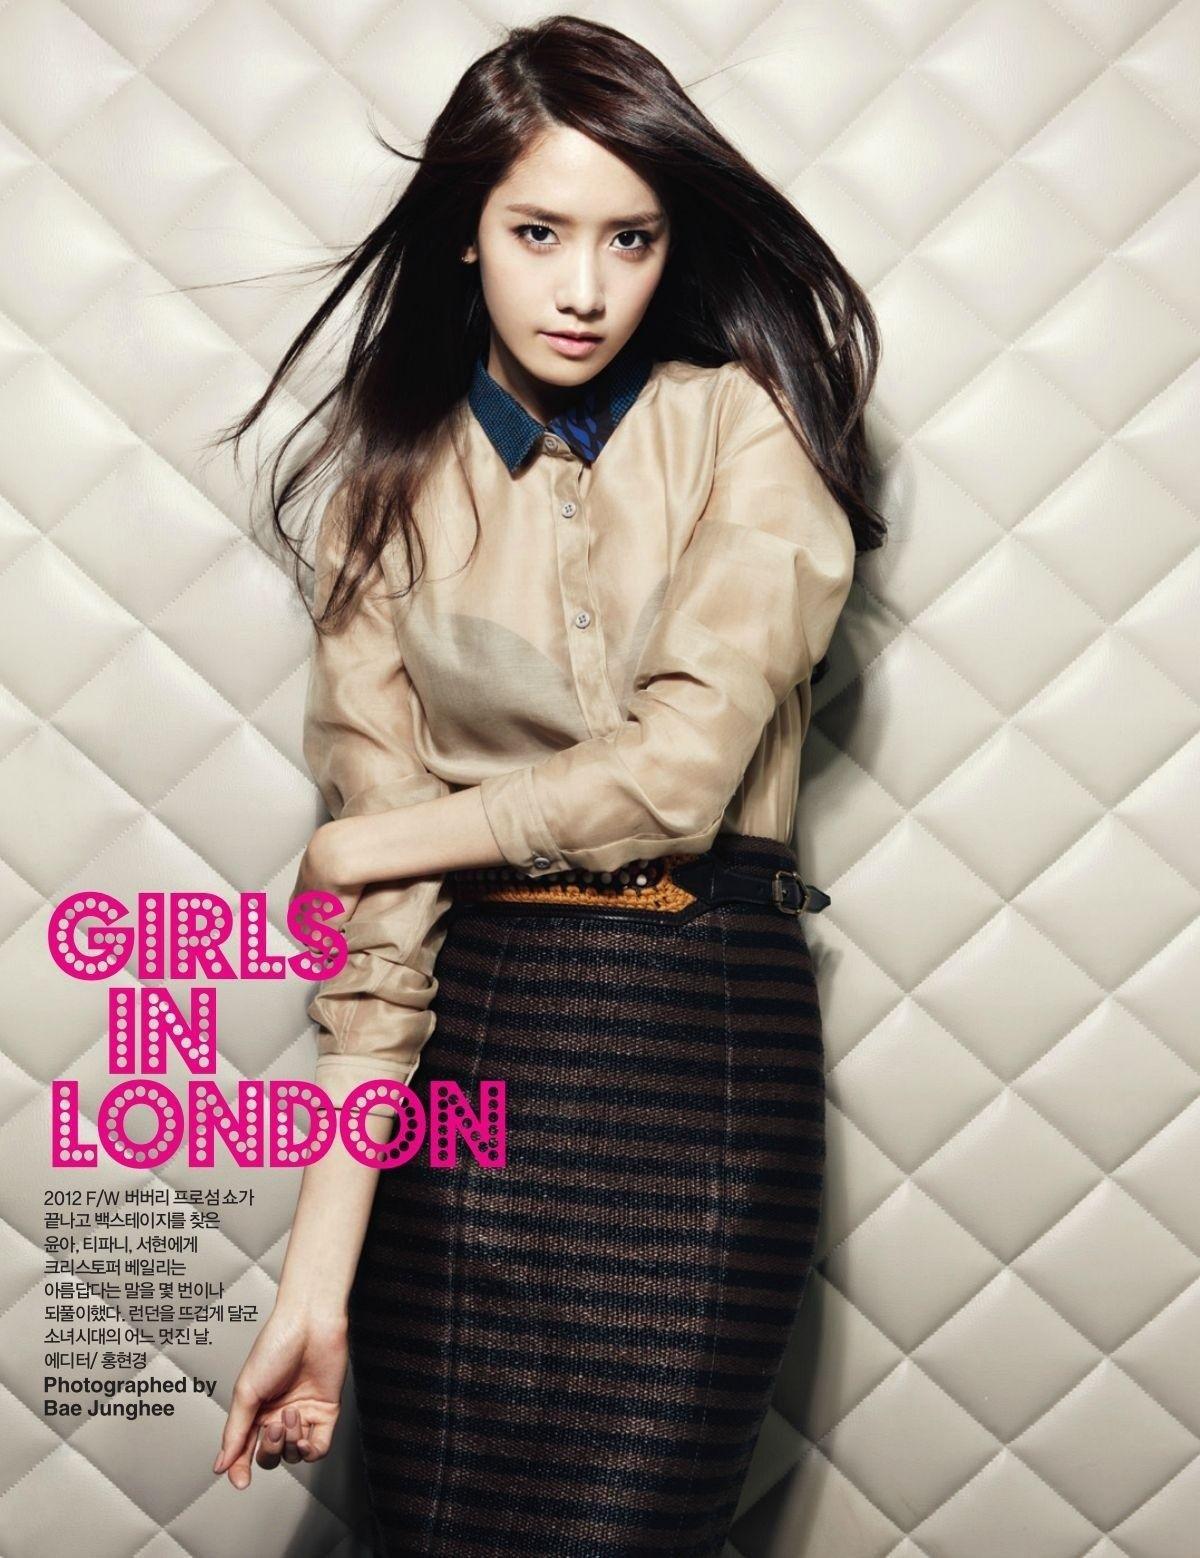 Girls in london yoona pinterest yoona